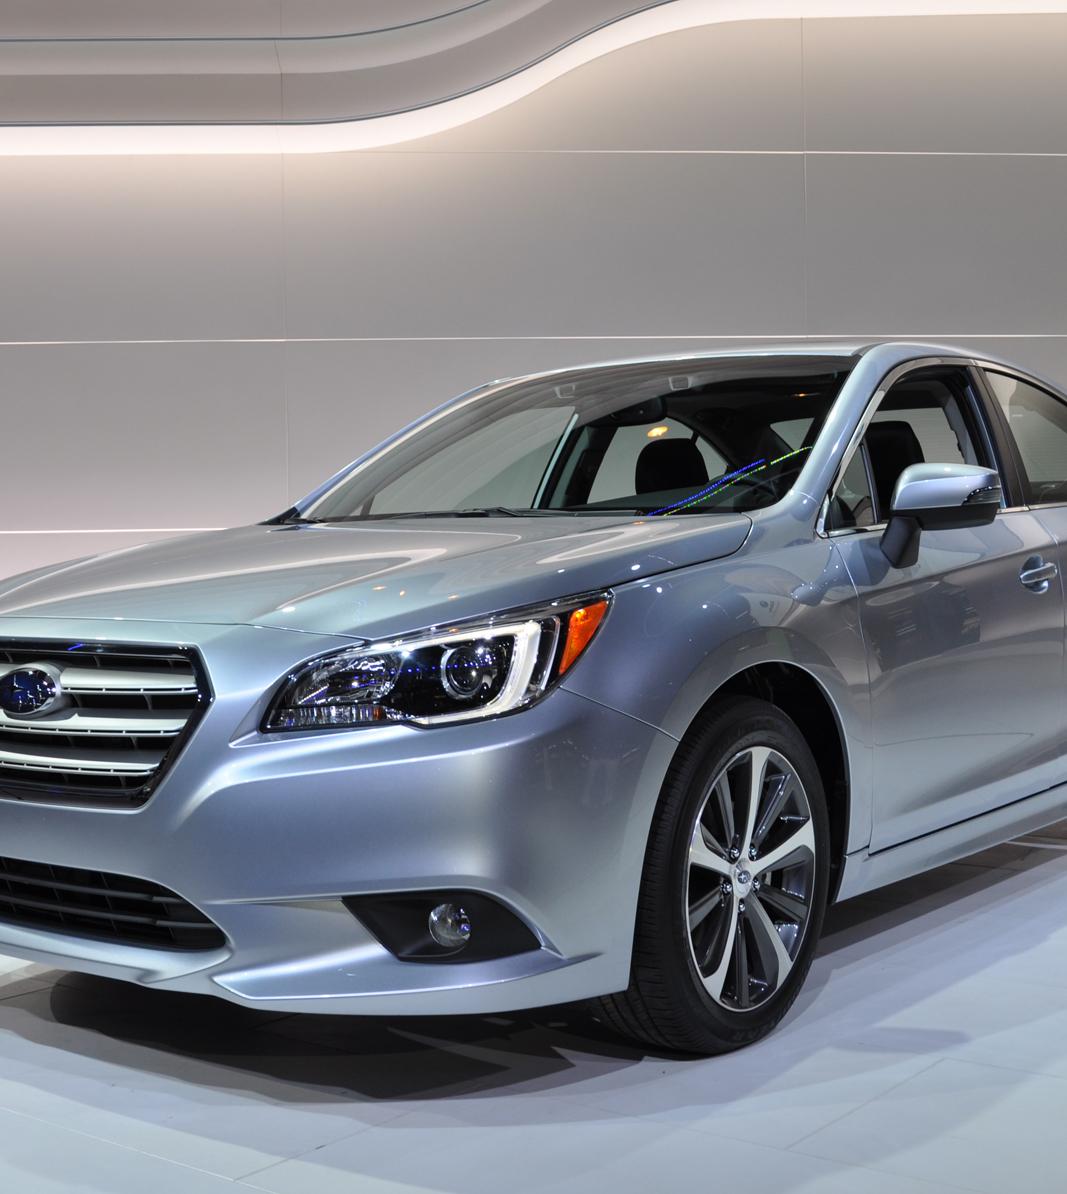 2015 Subaru Legacy sets its sights on Honda and Toyota